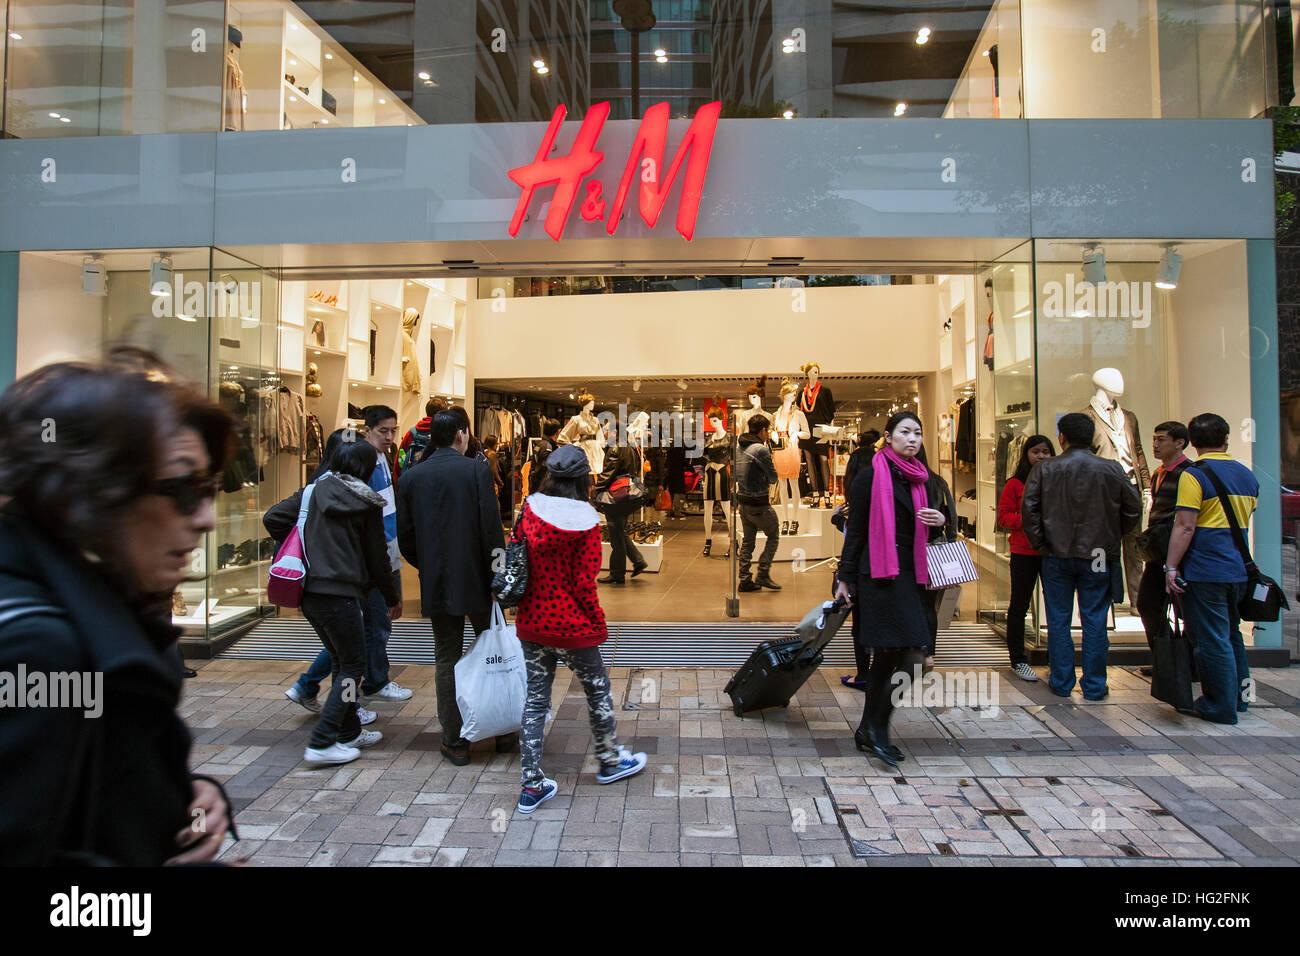 H&M fast fashion retai store Hong Kong - Stock Image